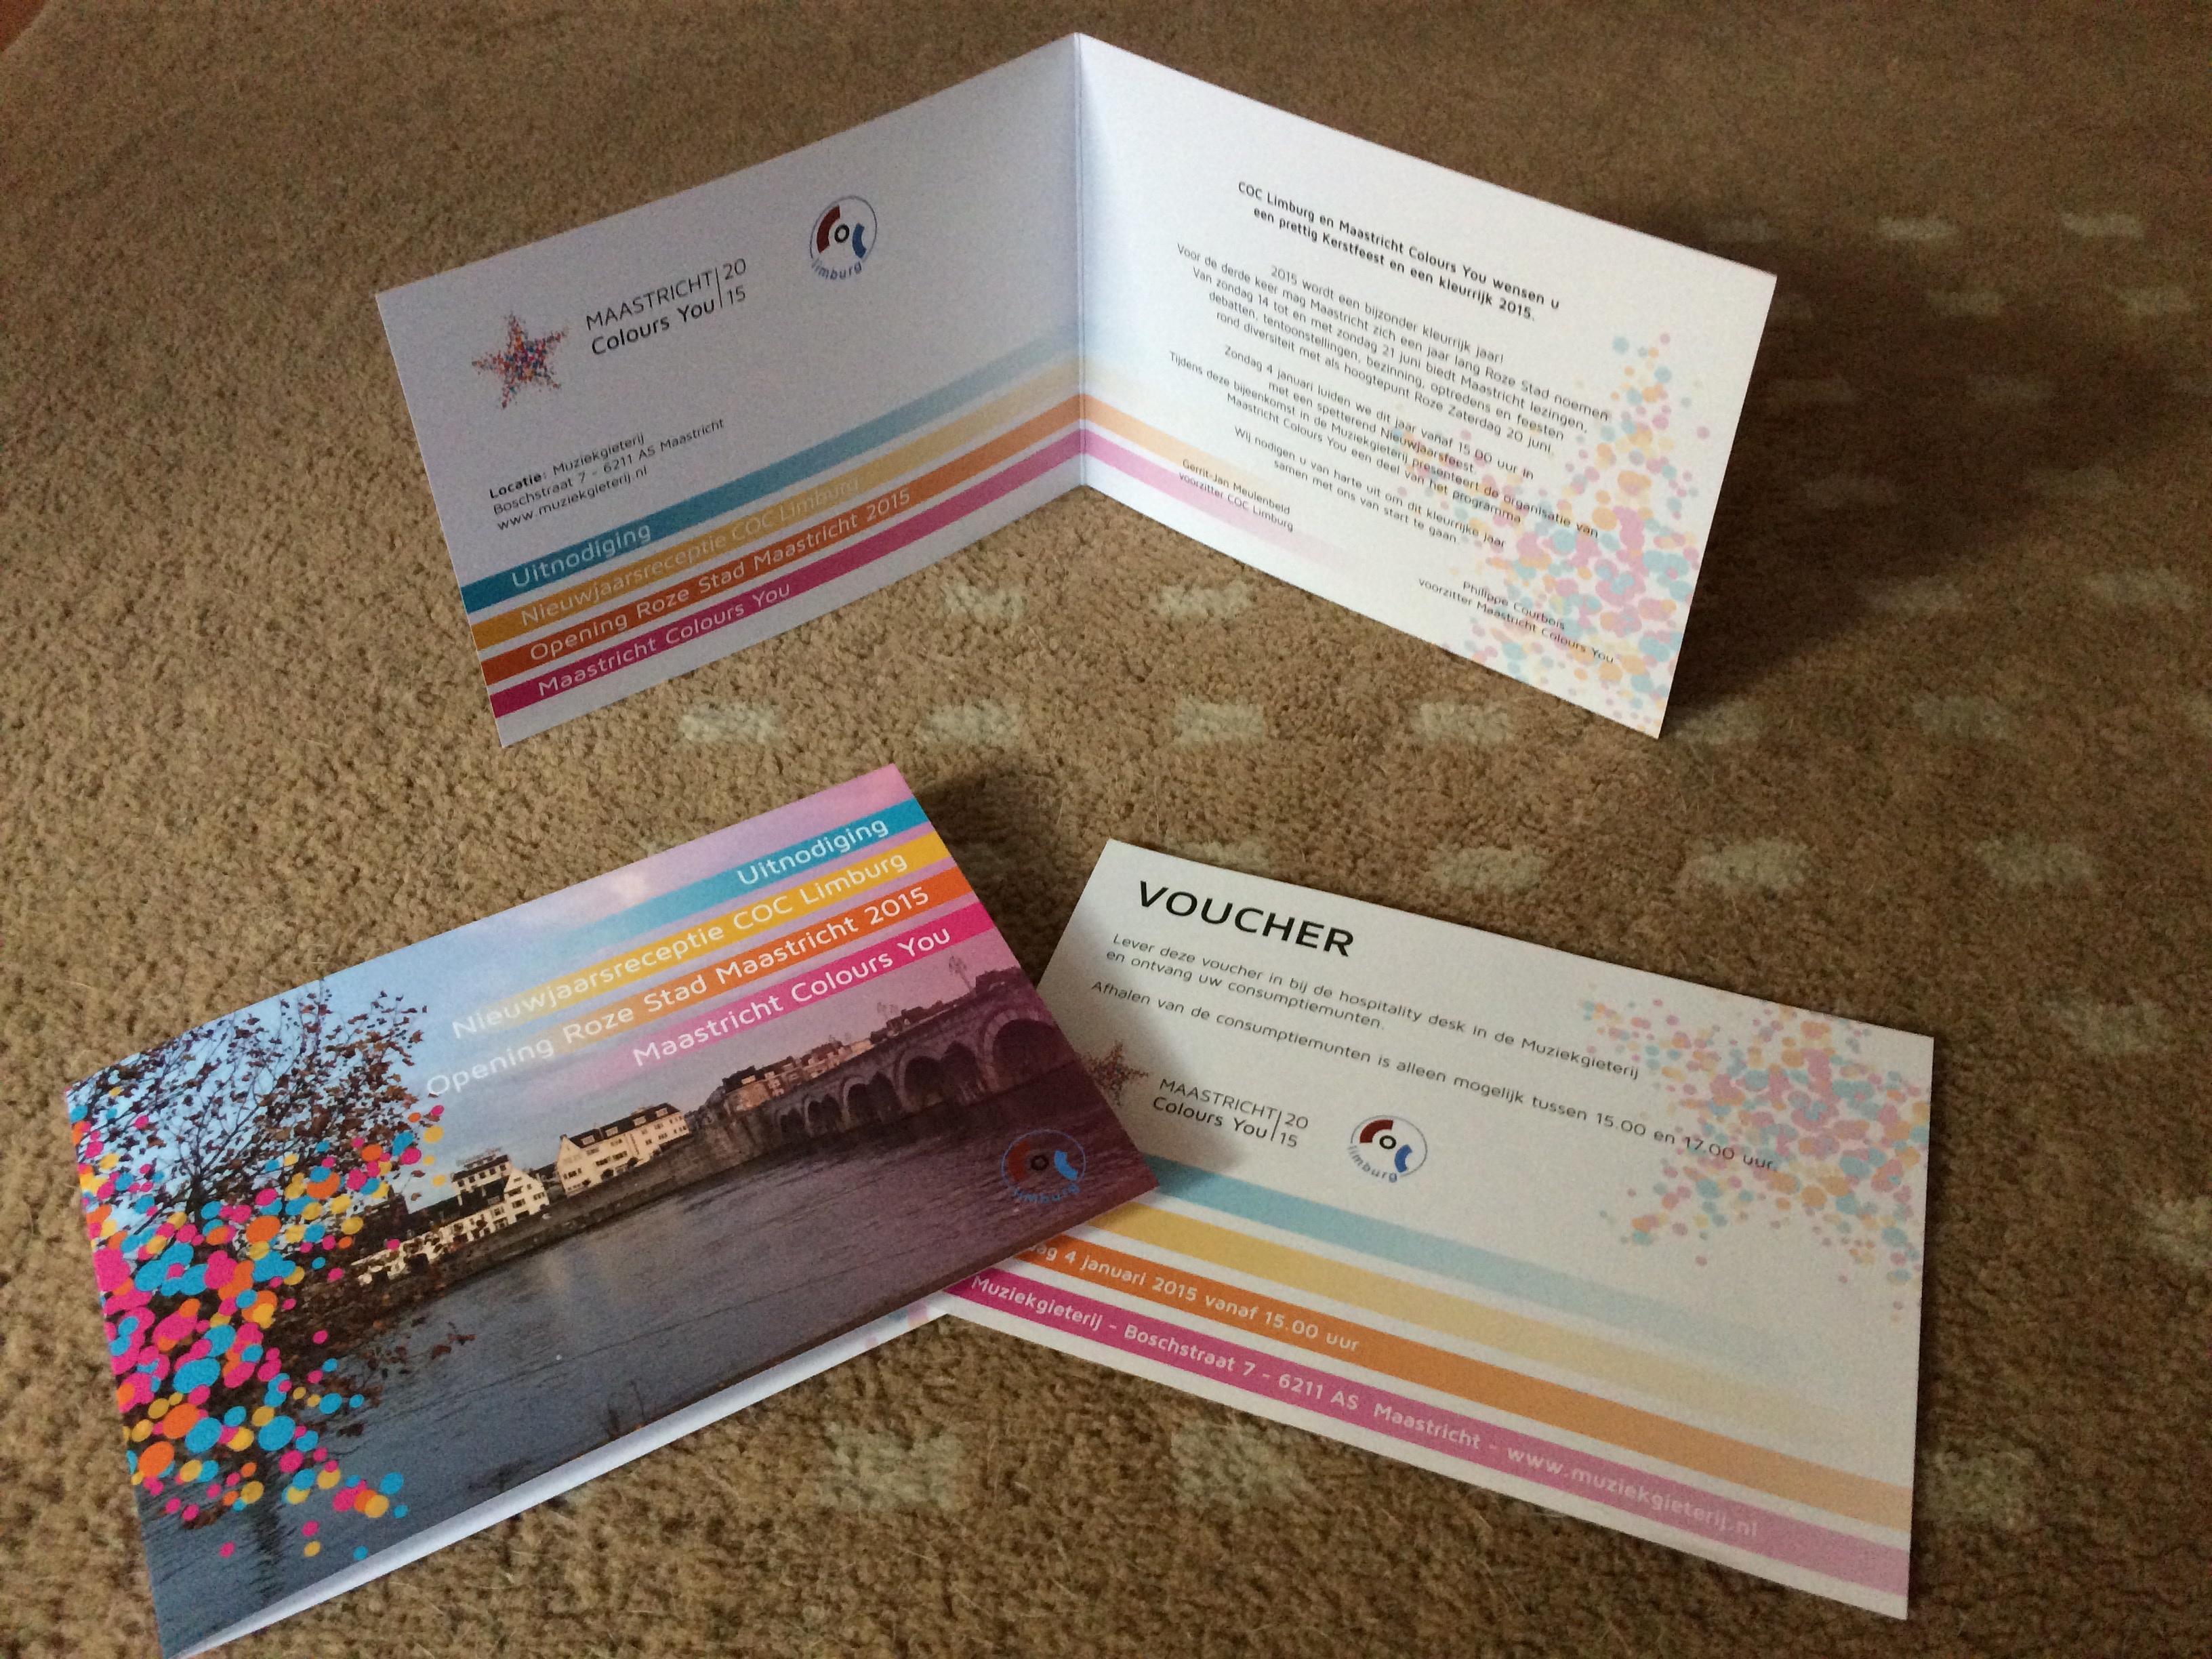 Uitnodiging Opening Roze Stad Maastricht 2015